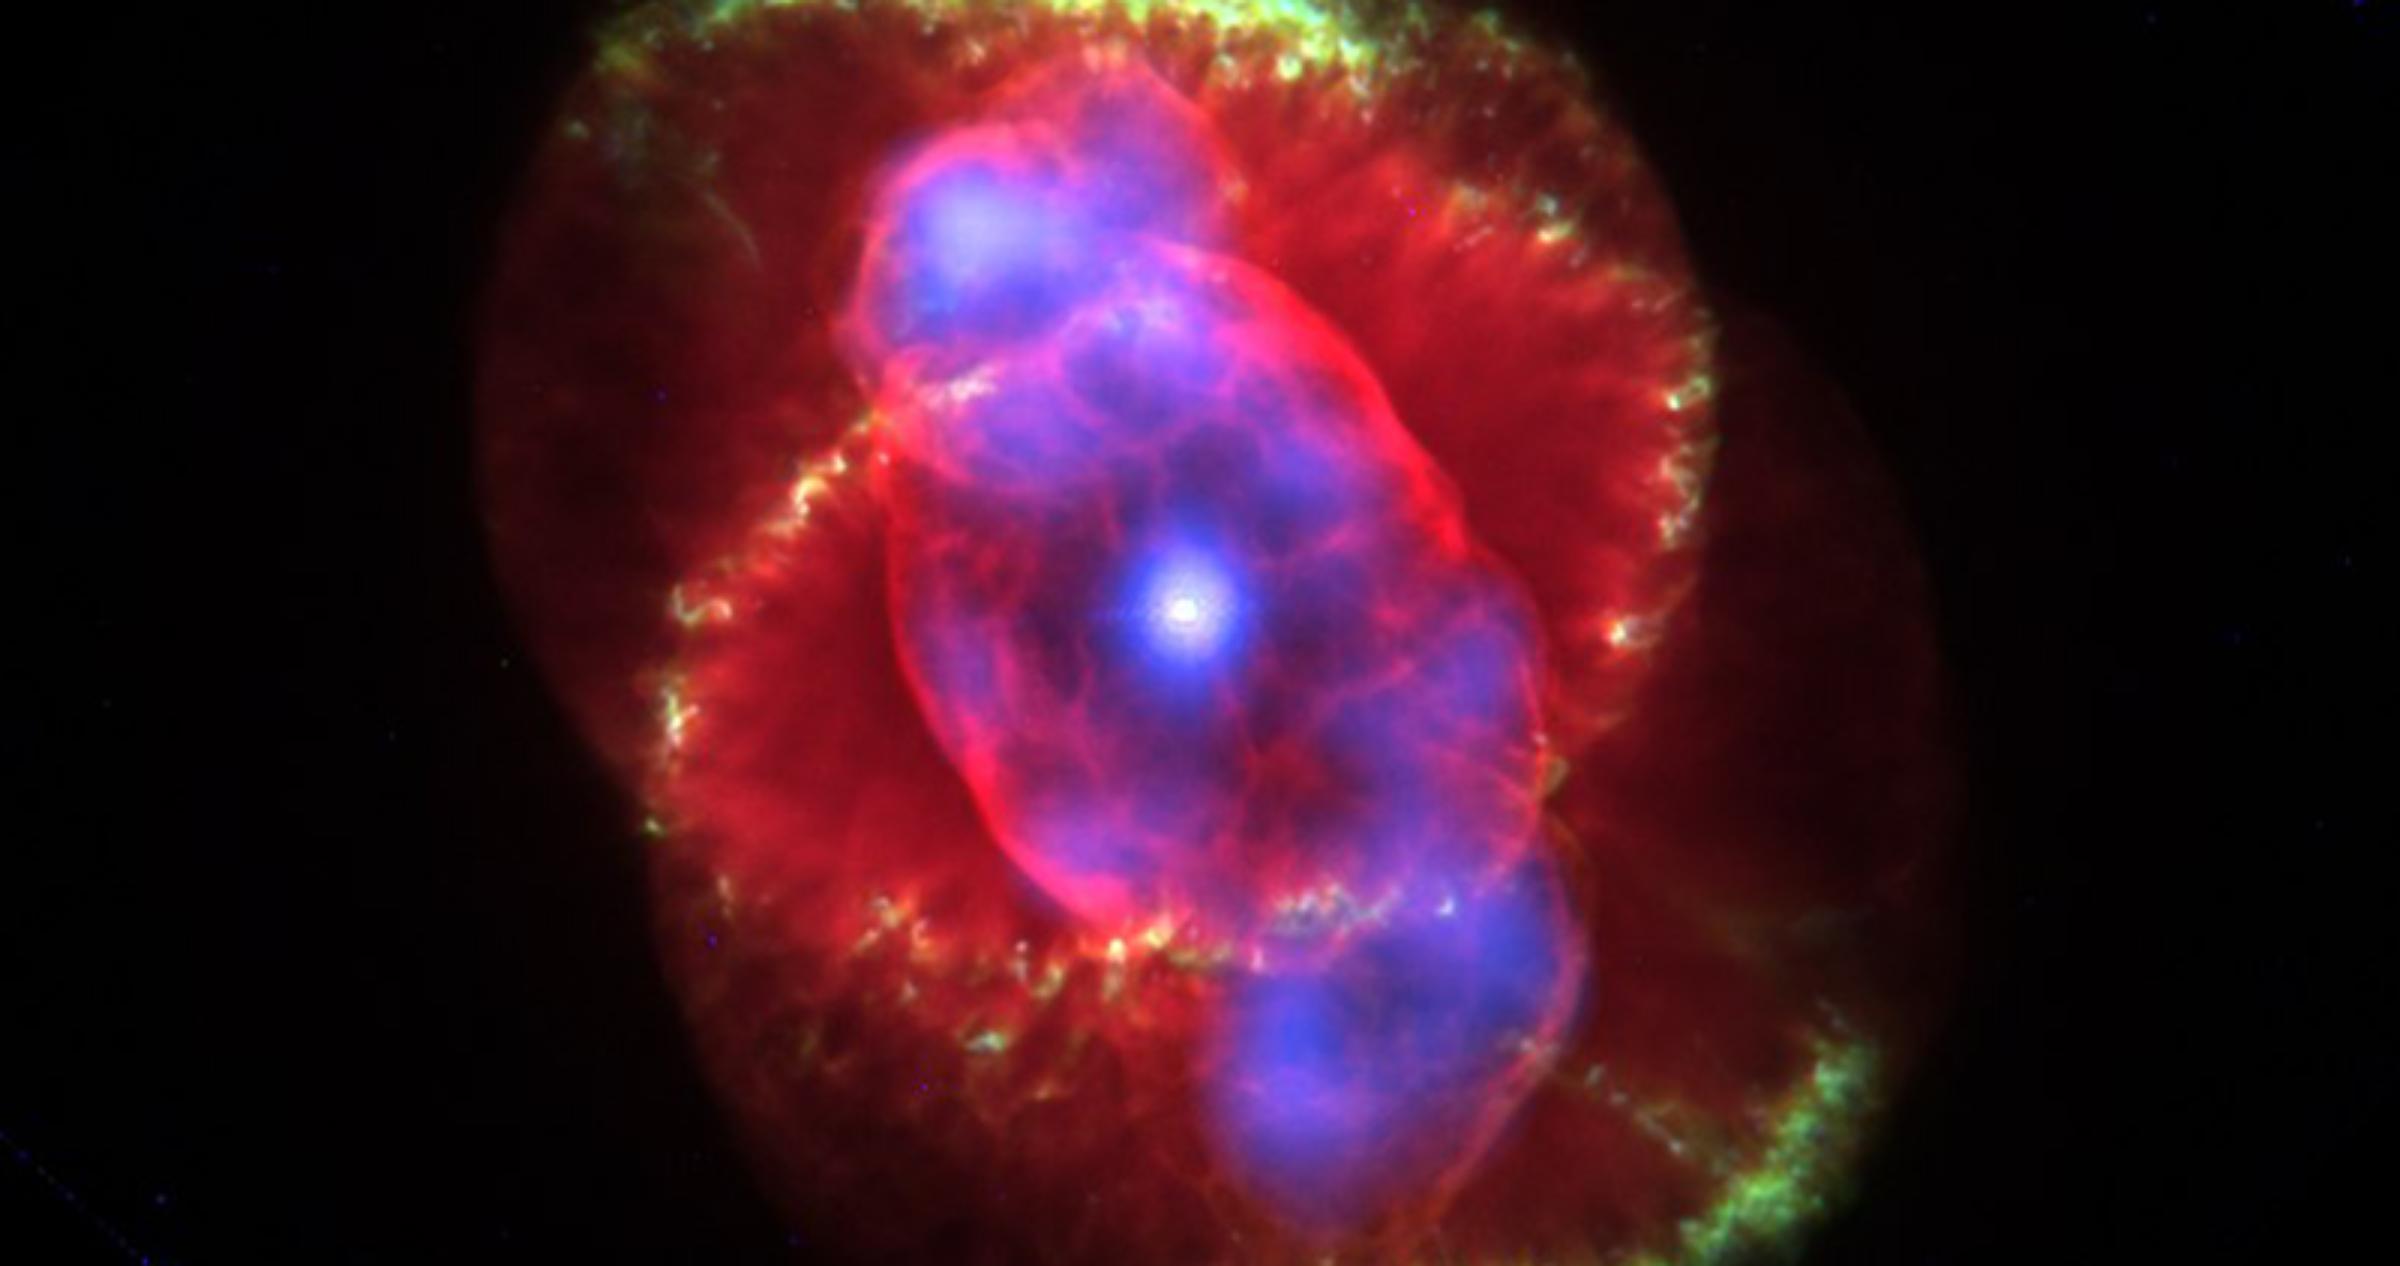 De toekomst van ons zonnestelsel